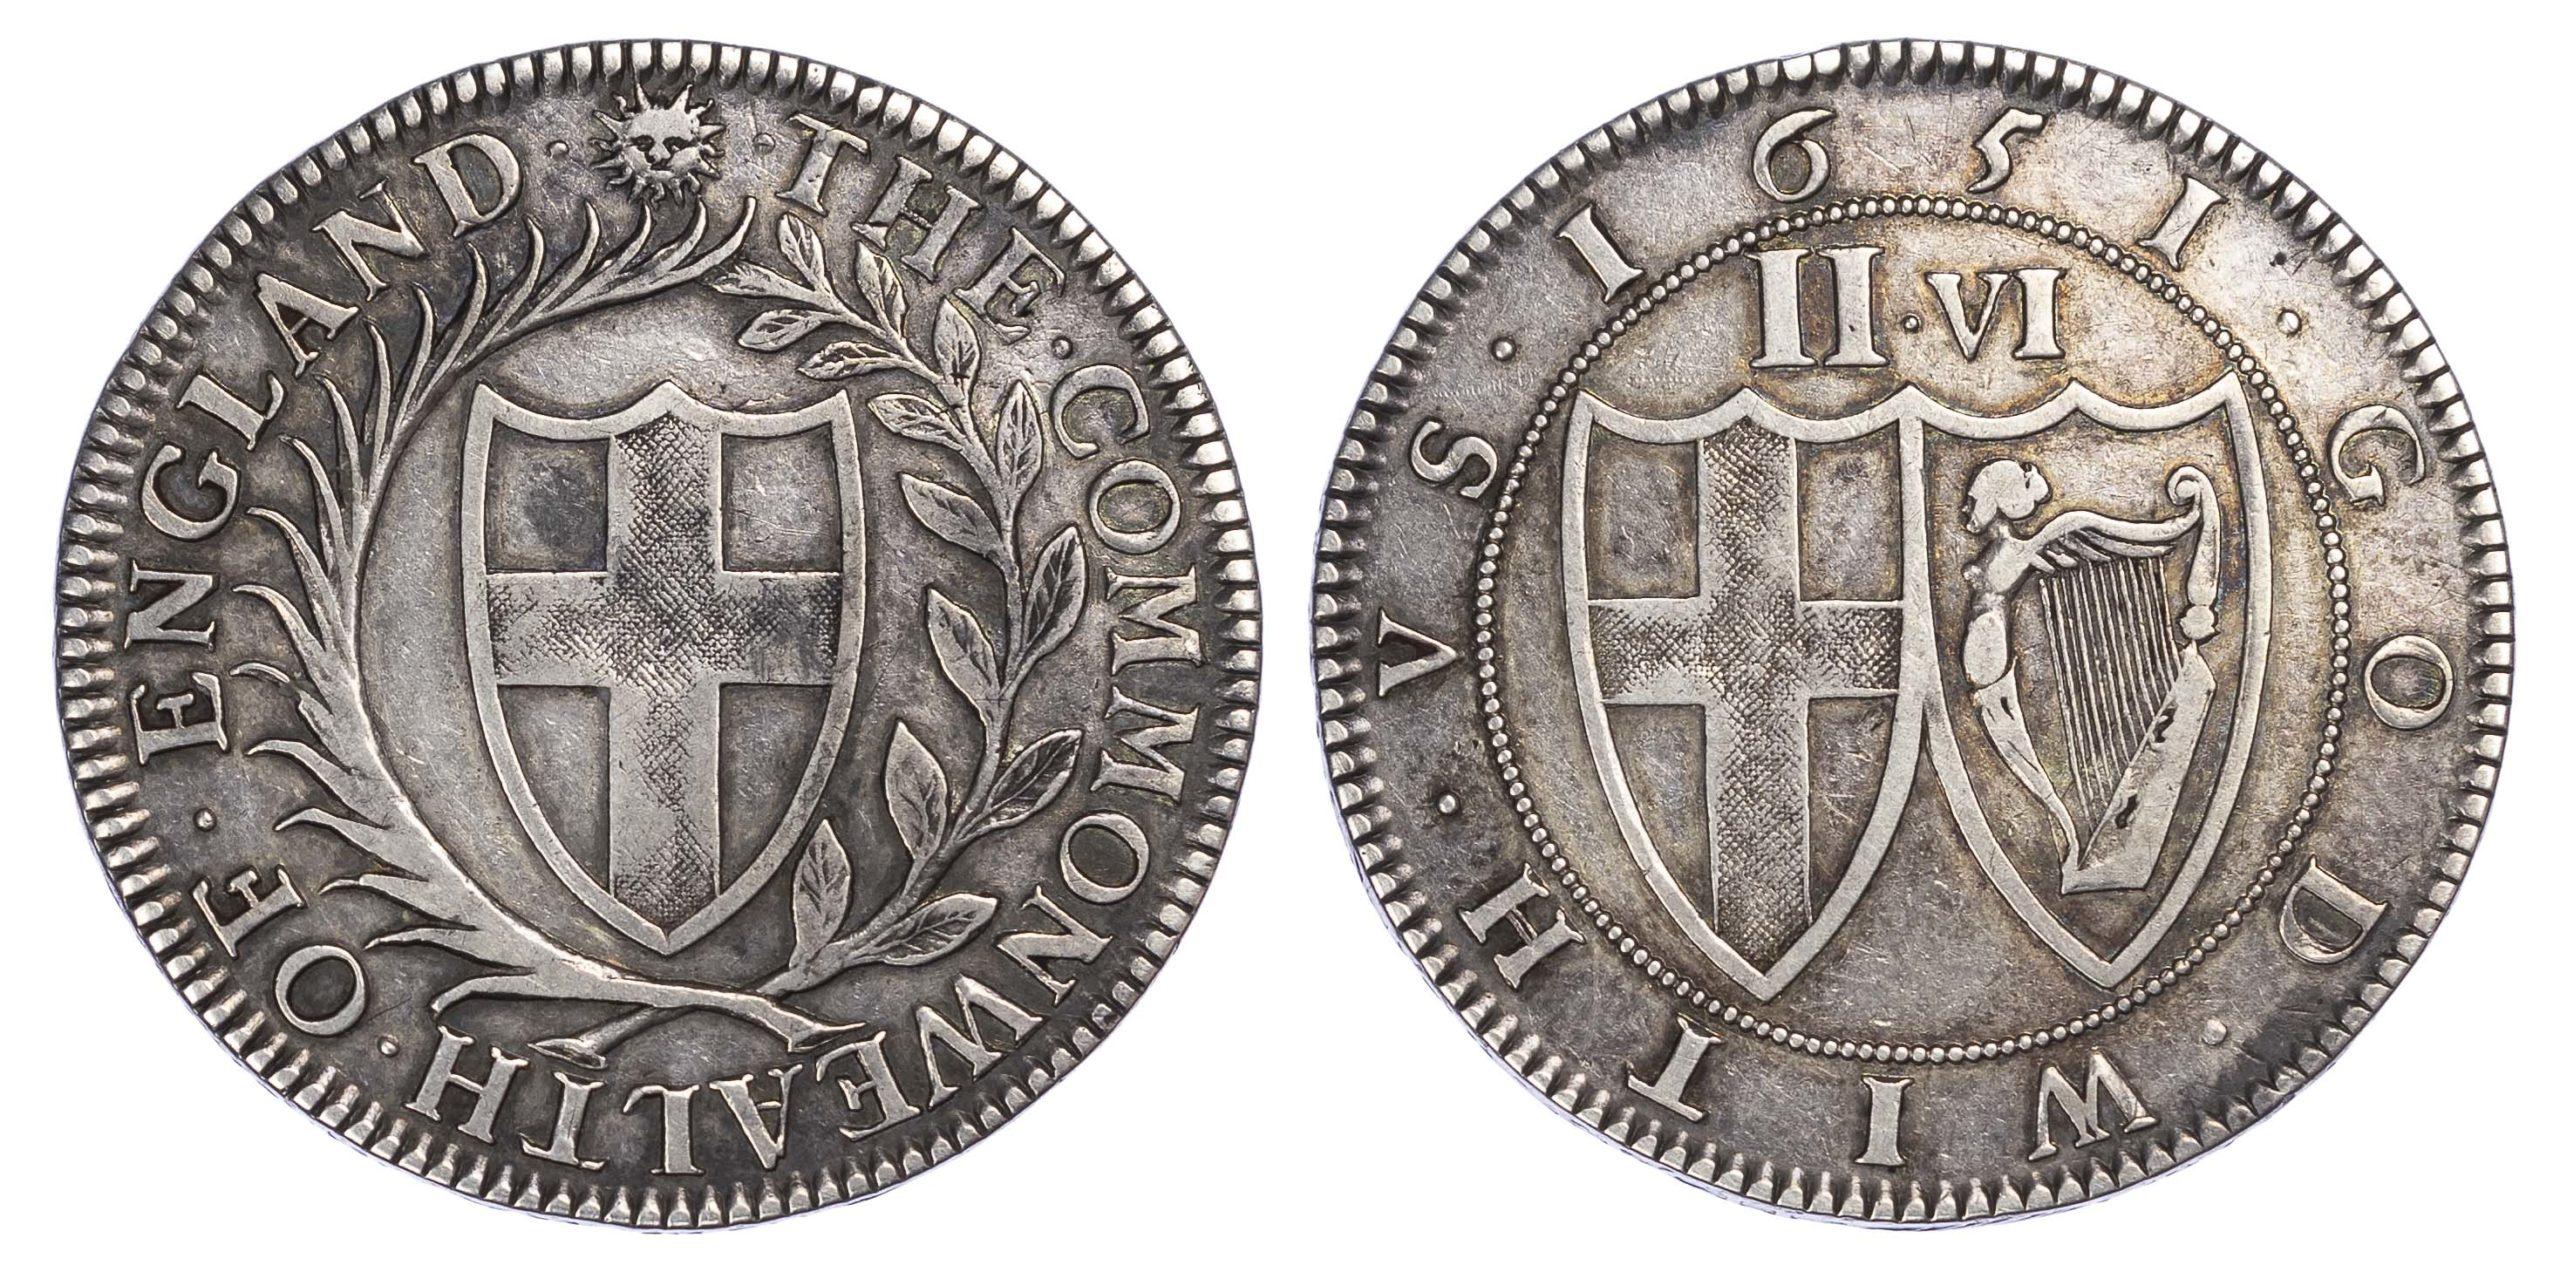 Commonwealth (1649-60), Pattern Halfcrown, 1651, Blondeau